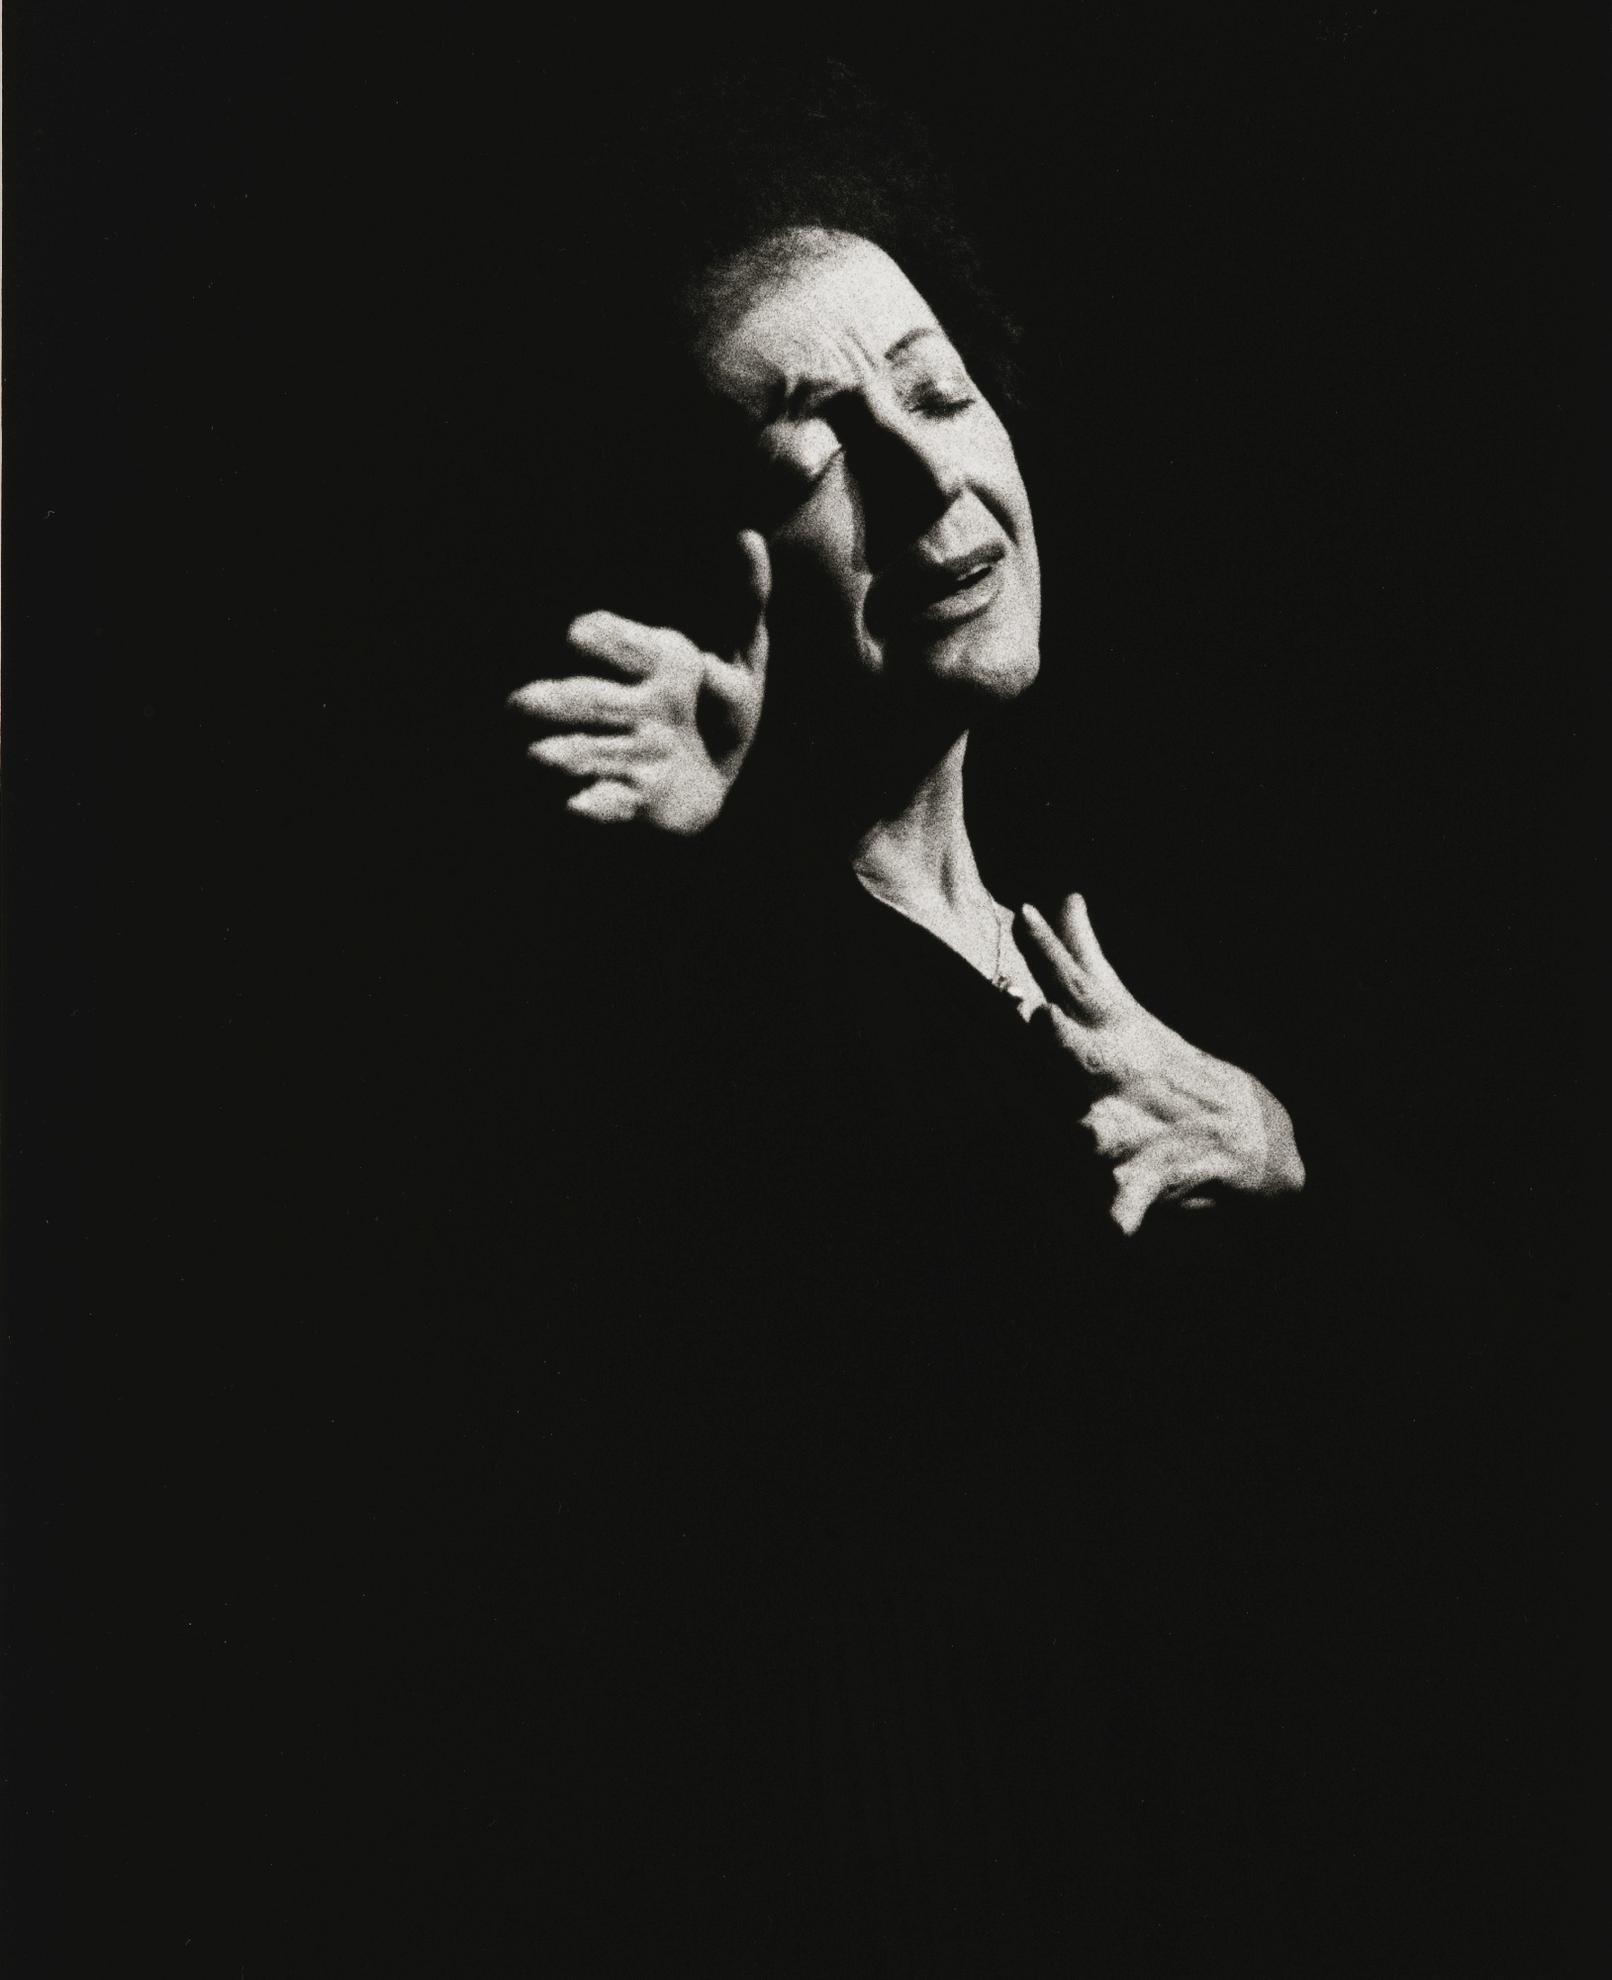 Jean-Philippe Charbonnier-Edith Piaf-1962